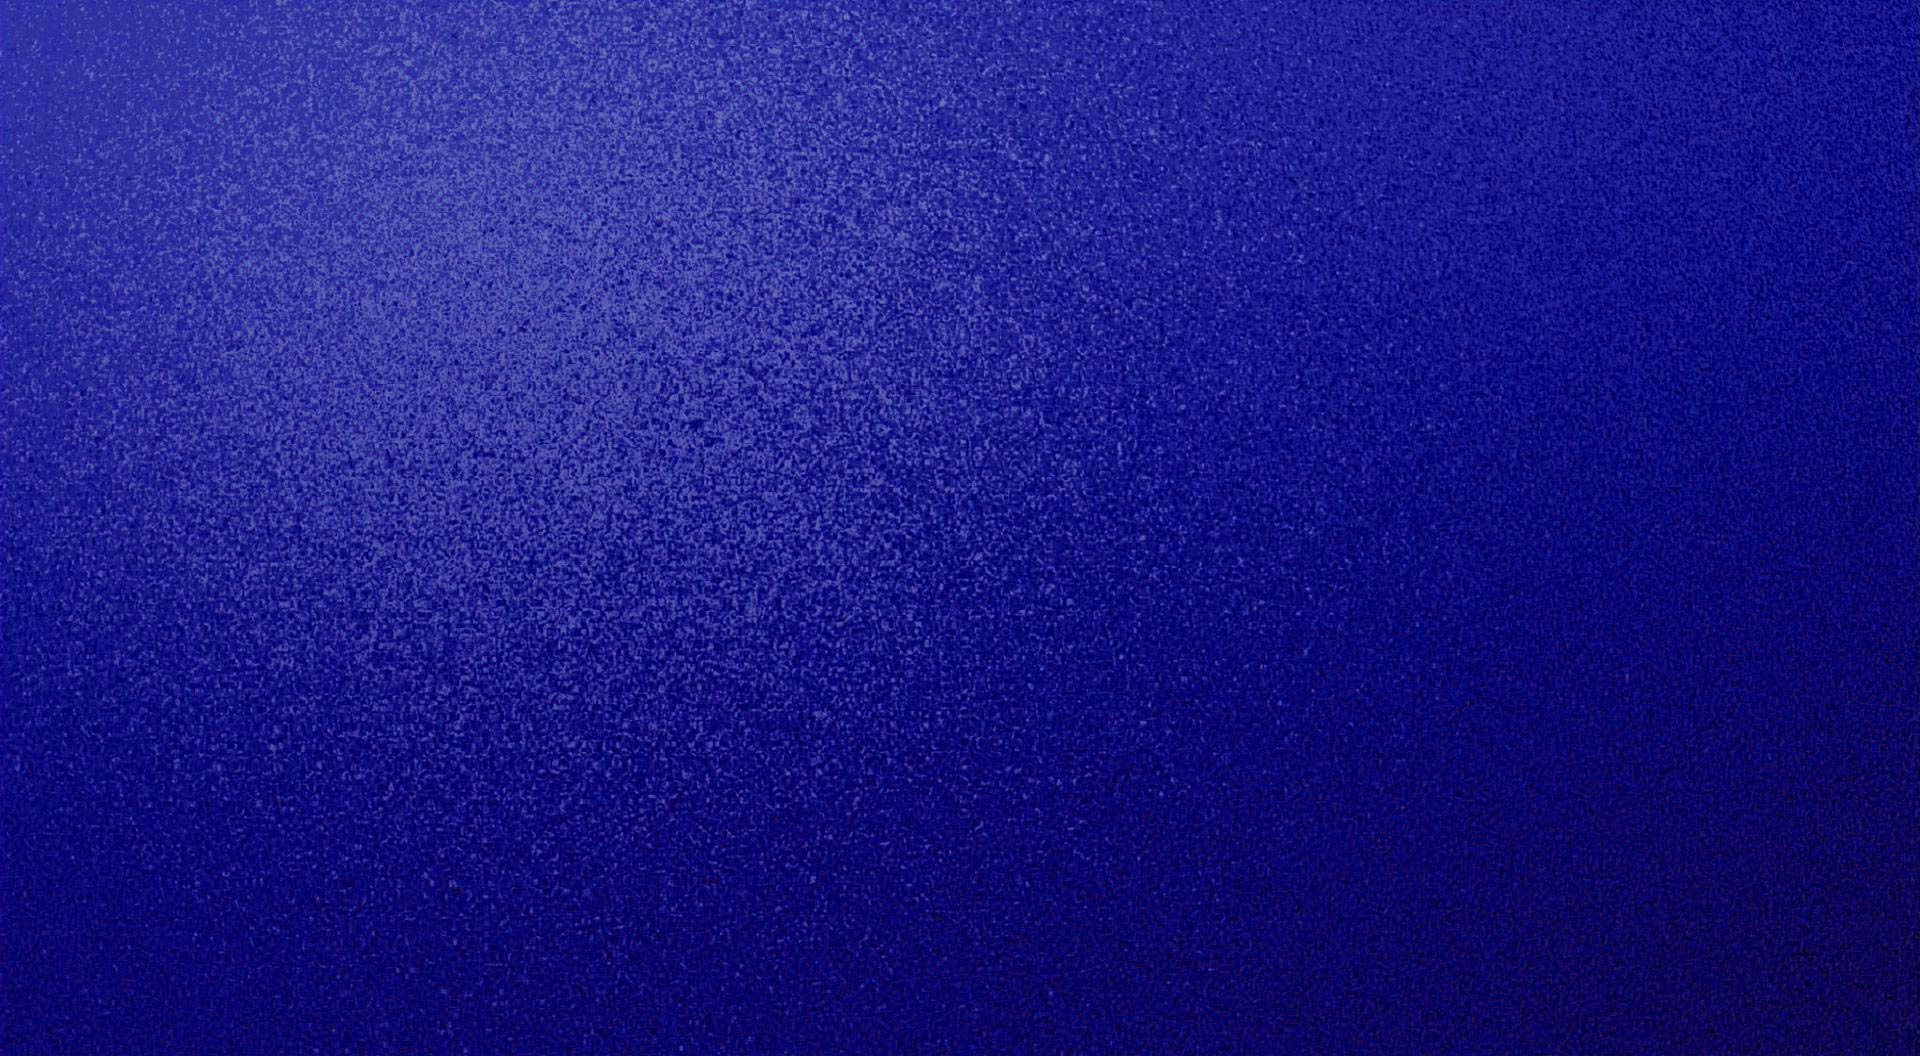 Grey Texture Background and Wallpaper for Designer Web Design ...